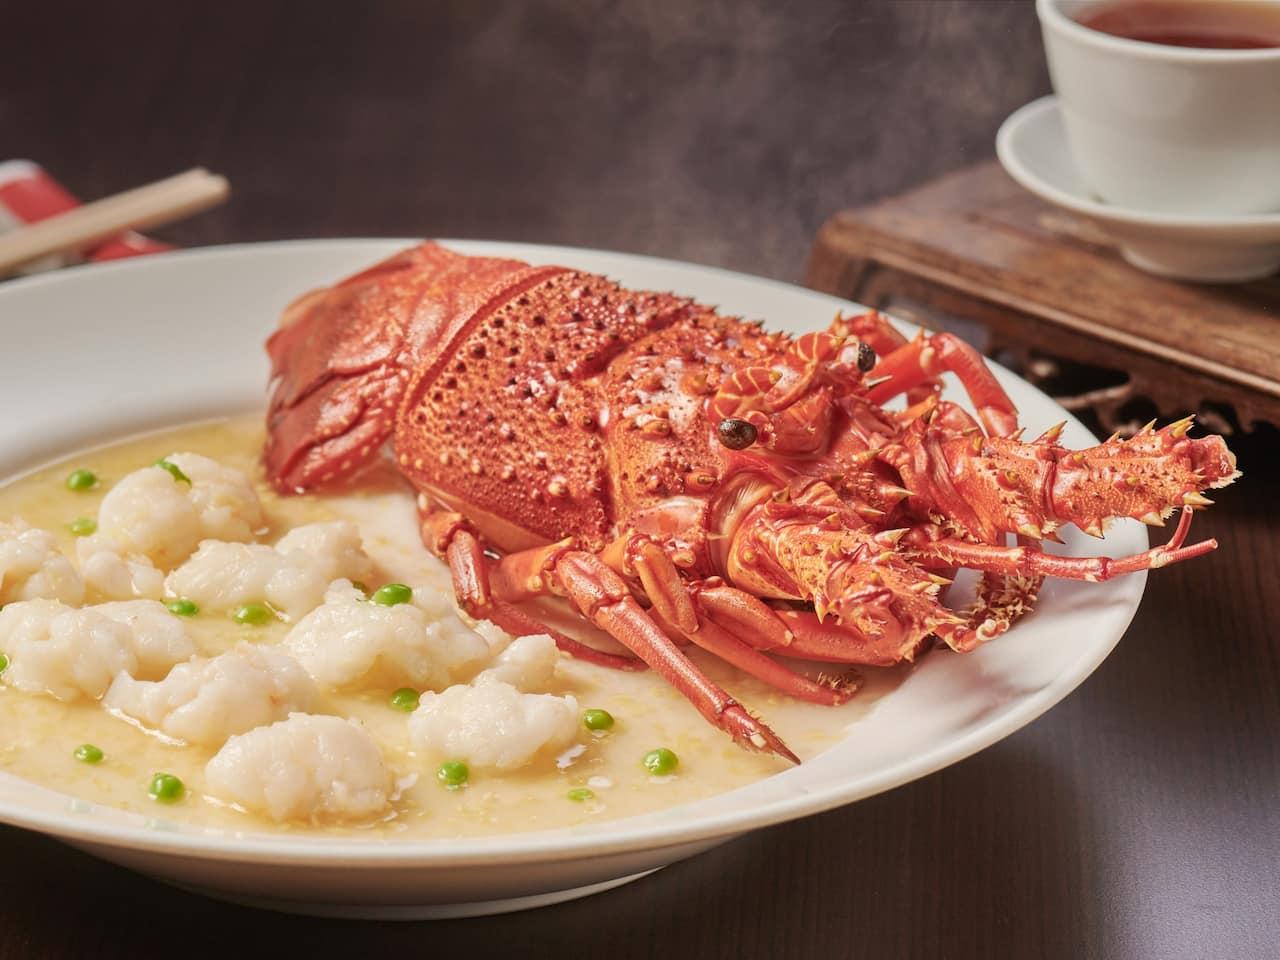 Chinese Restaurant Pan Fried Sea Cucumber